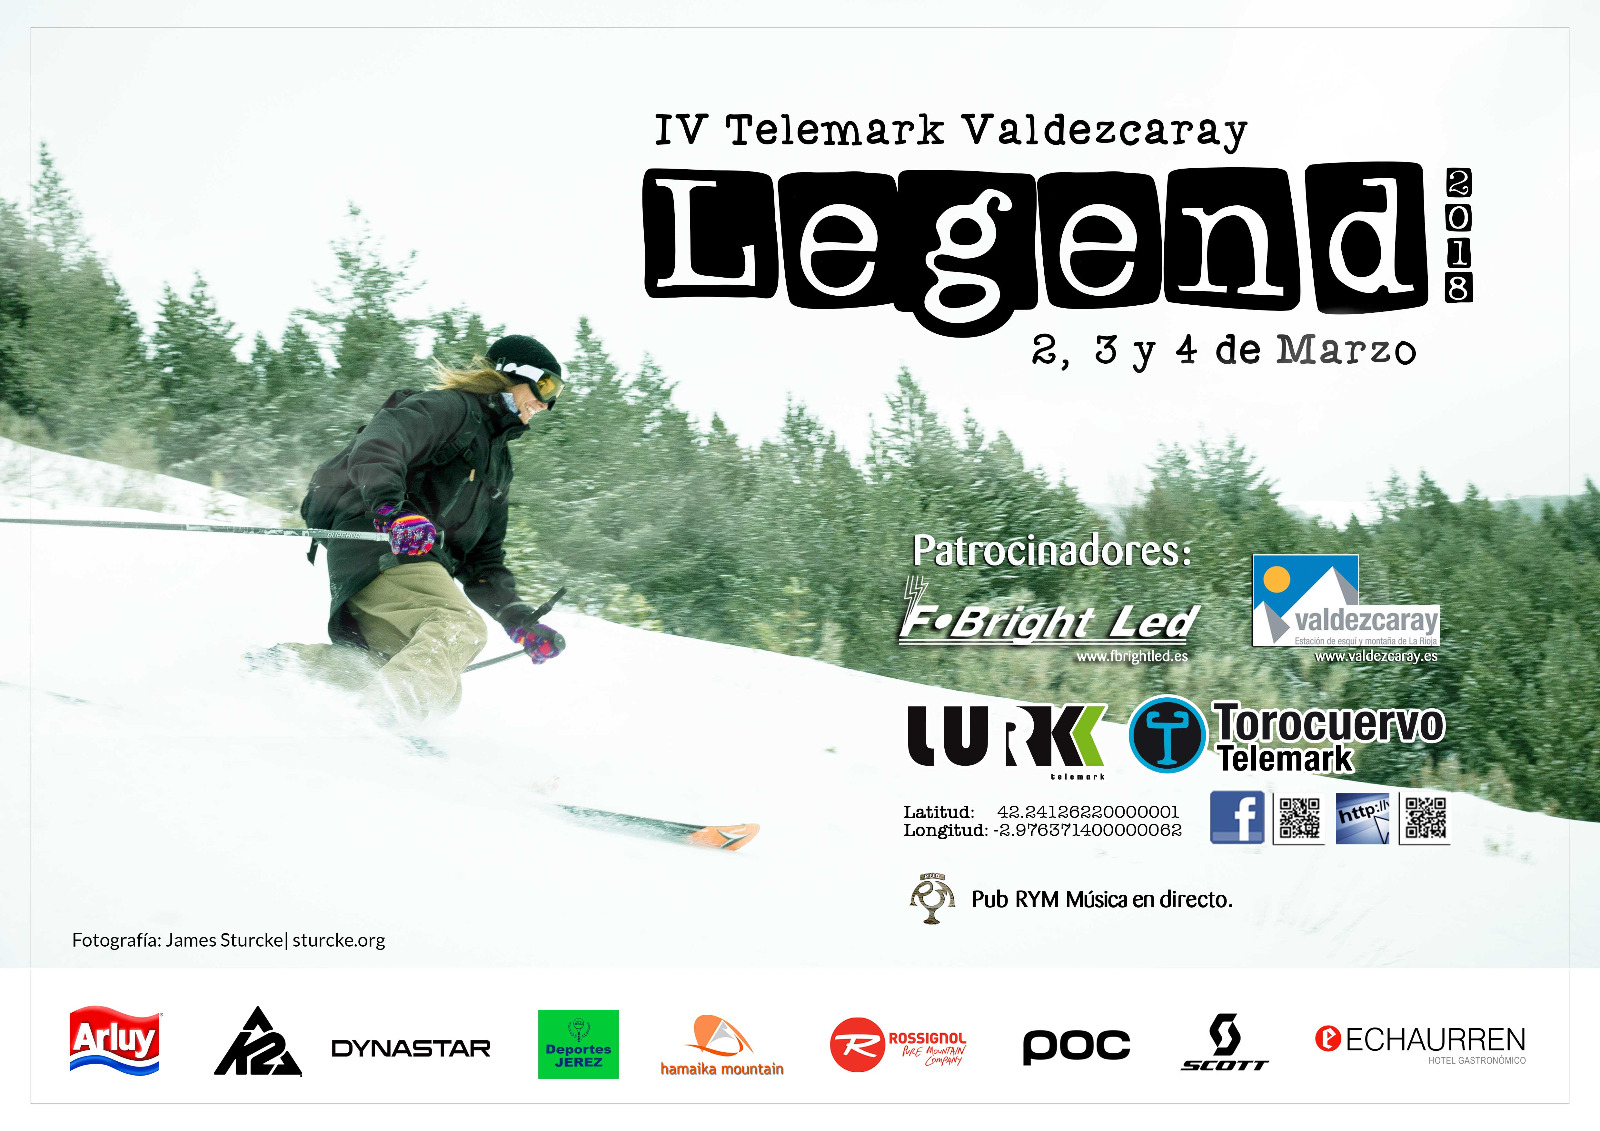 Telemark Valdezcaray Legend